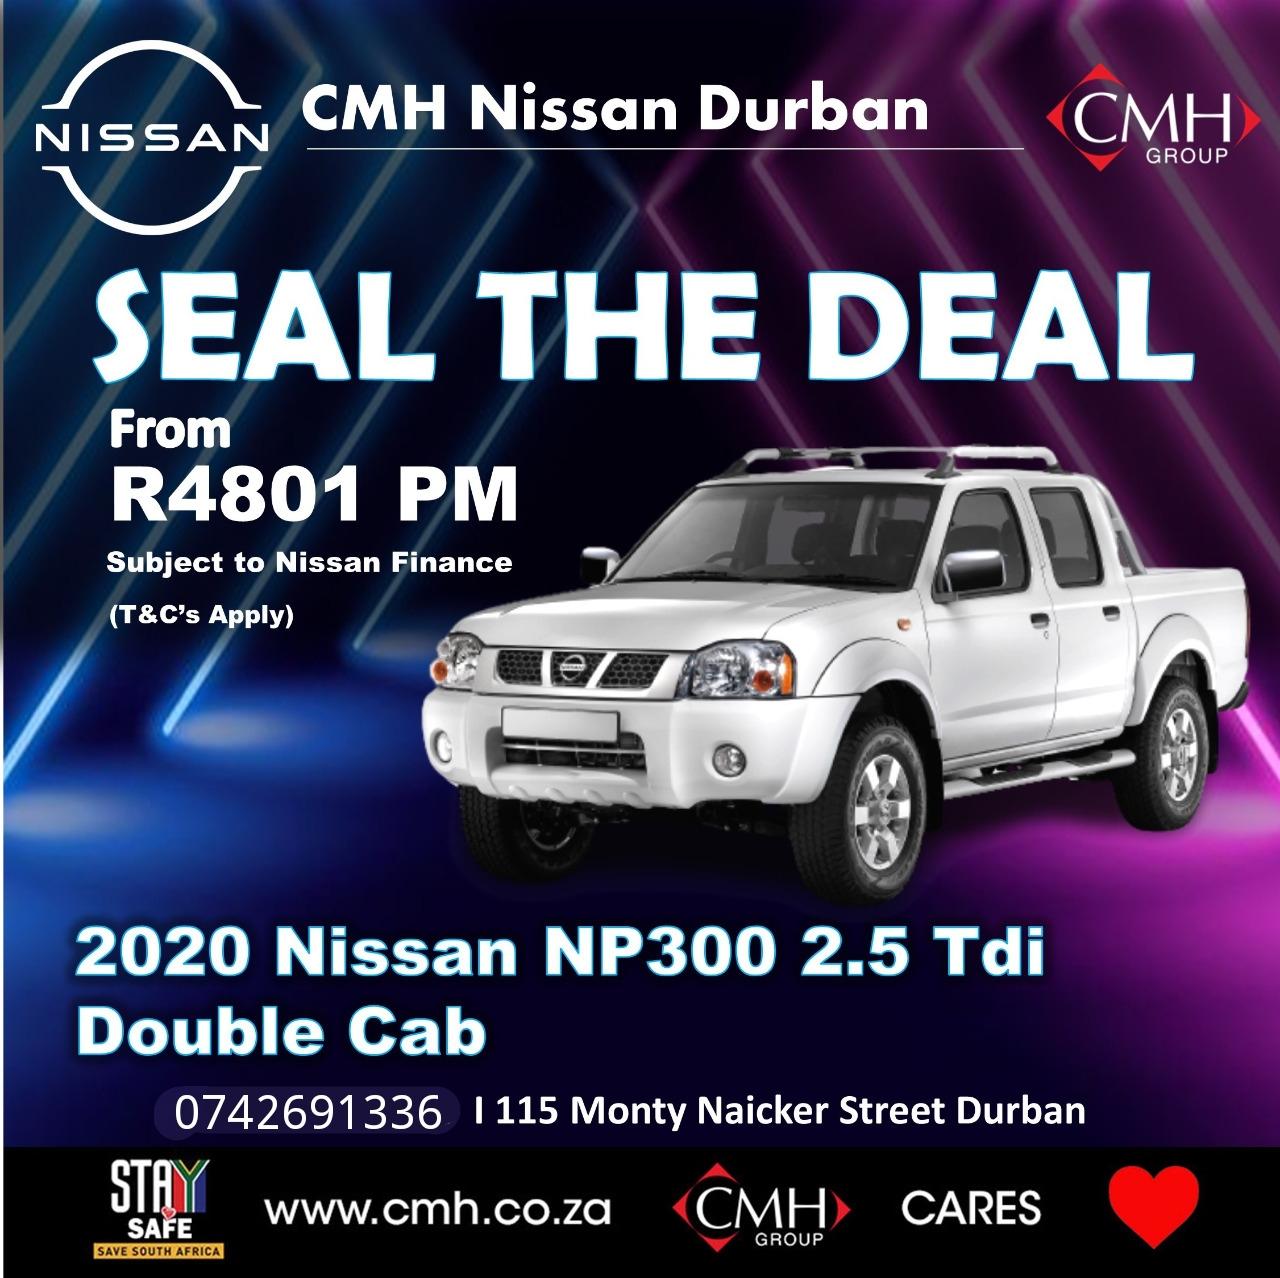 2020 Nissan NP300 Hardbody 2.5TDi double cab